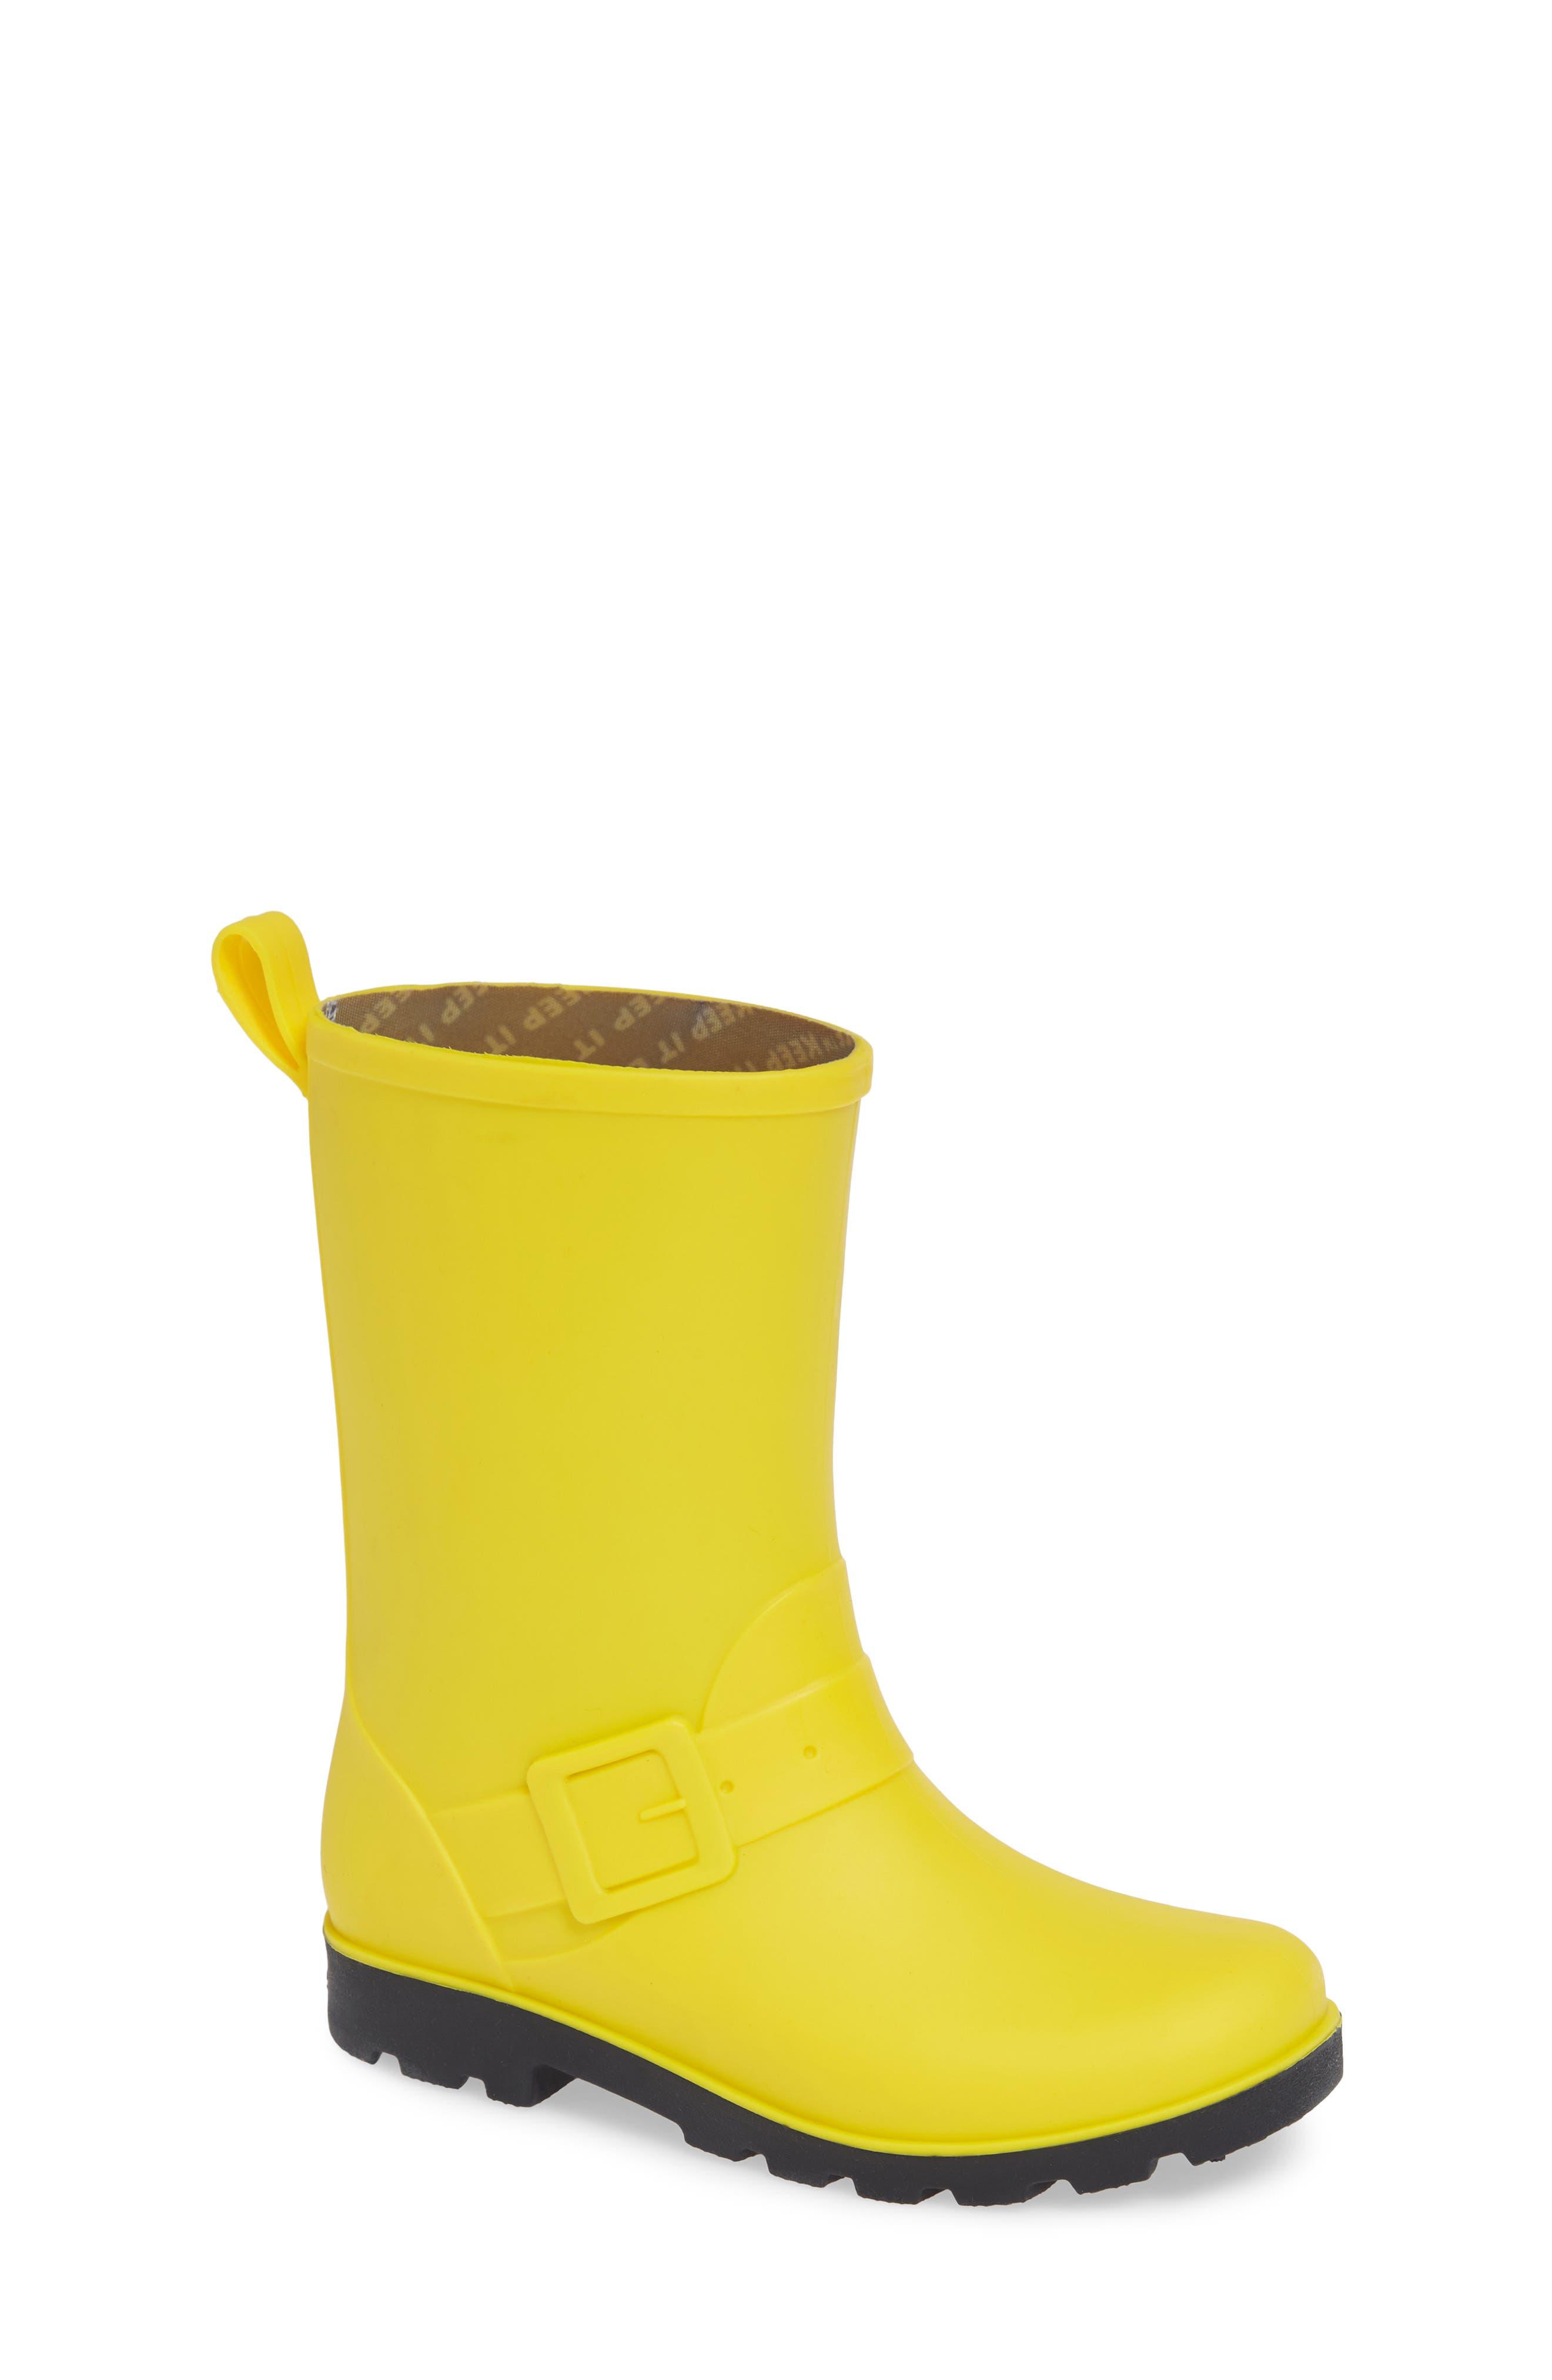 Native Barnett Rain Boot,                             Main thumbnail 1, color,                             CRAYON YELLOW/ JIFFY BLACK